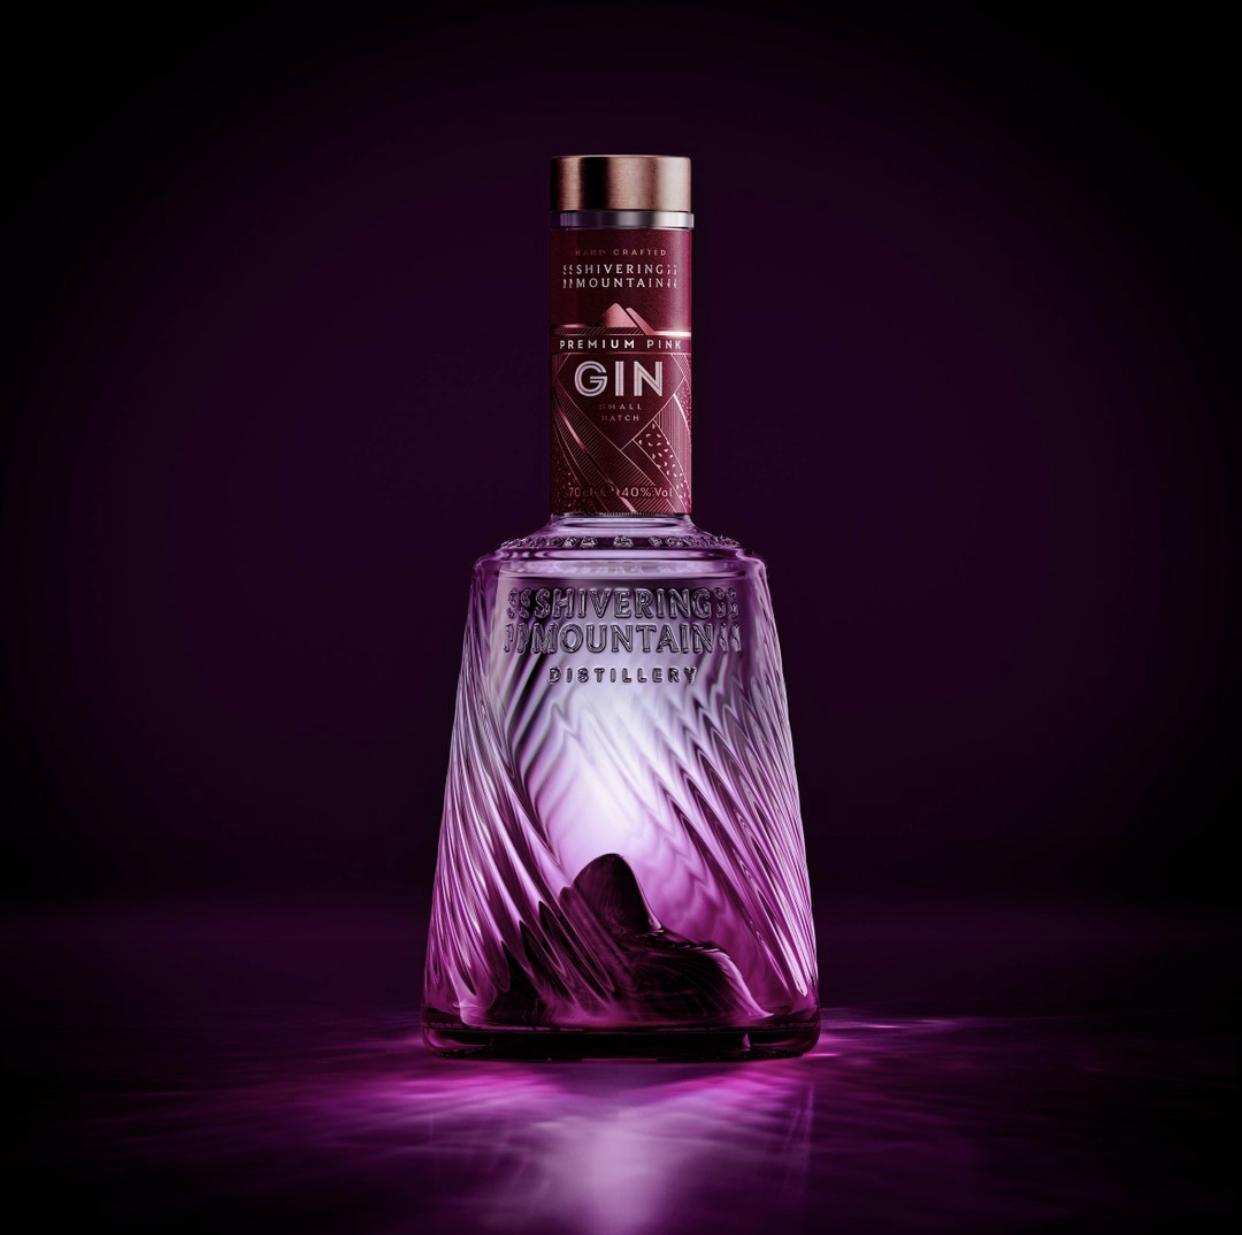 Shivering Mountain Premier Gin